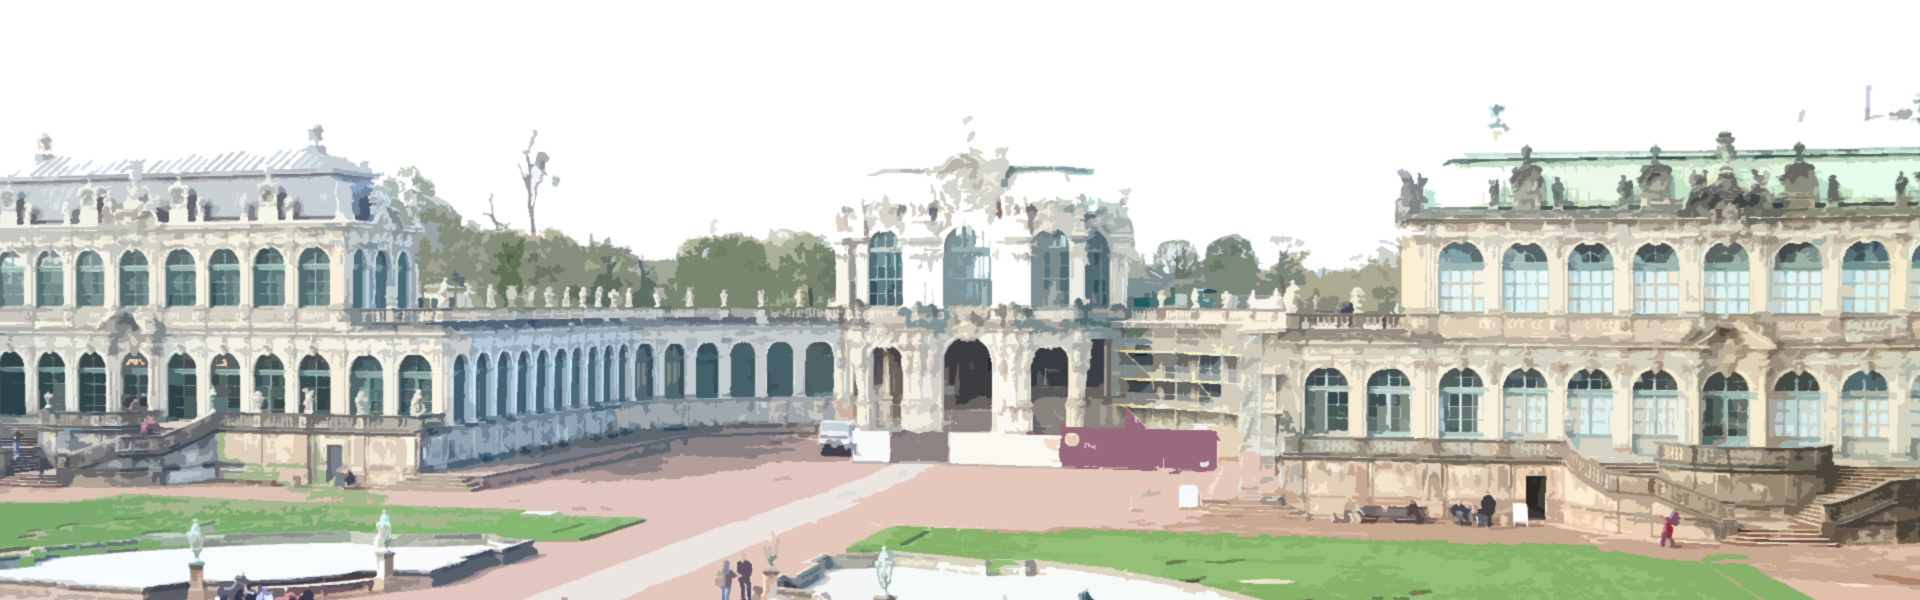 miho in Dresden 2021